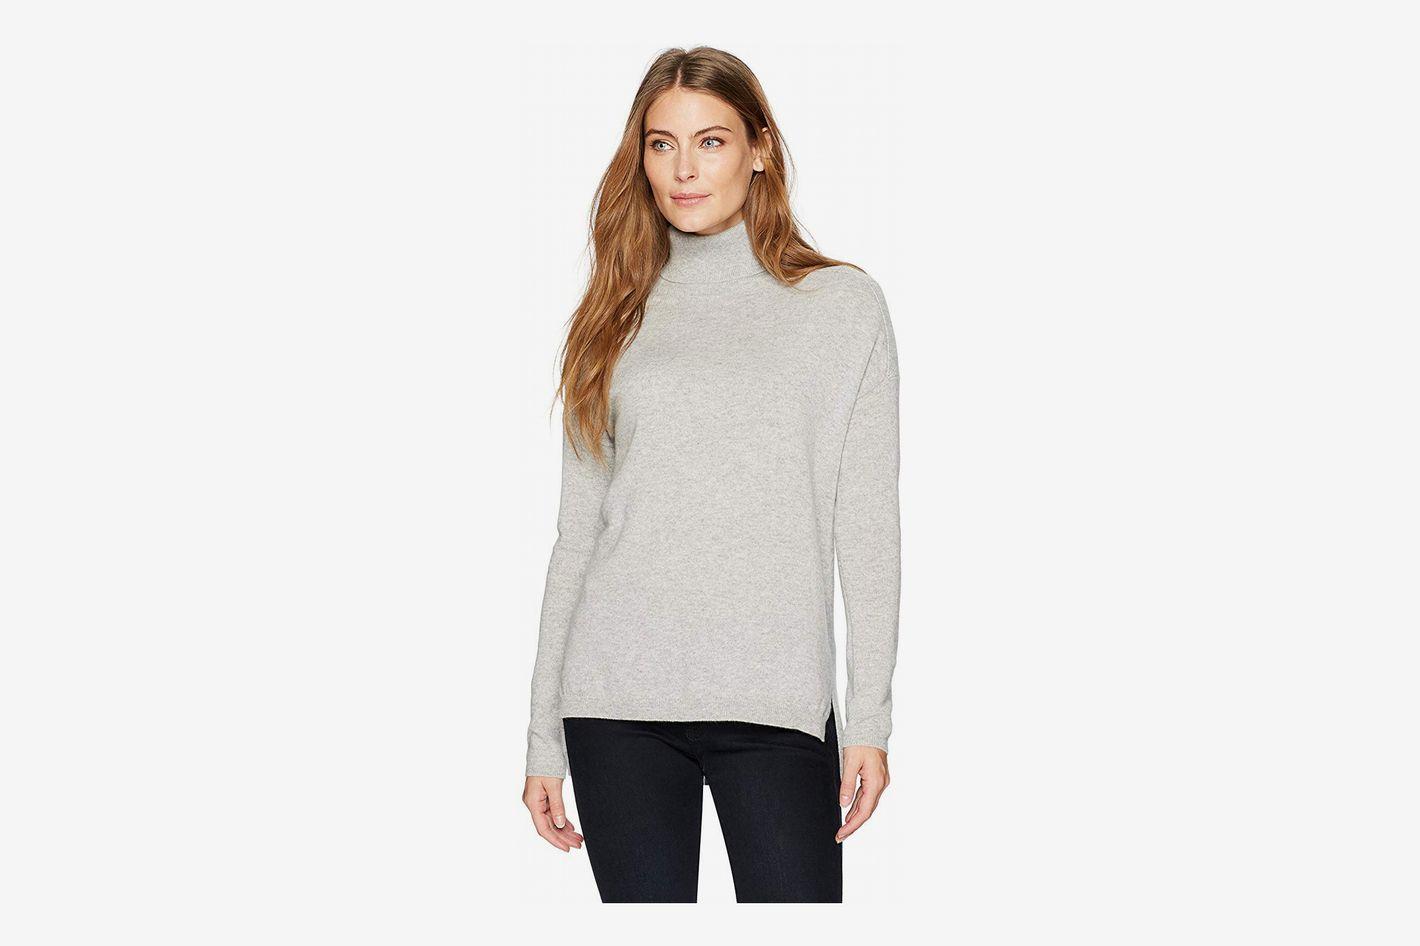 Lark & Ro Women's 100% Cashmere Soft Slouchy Turtleneck Pullover Sweater